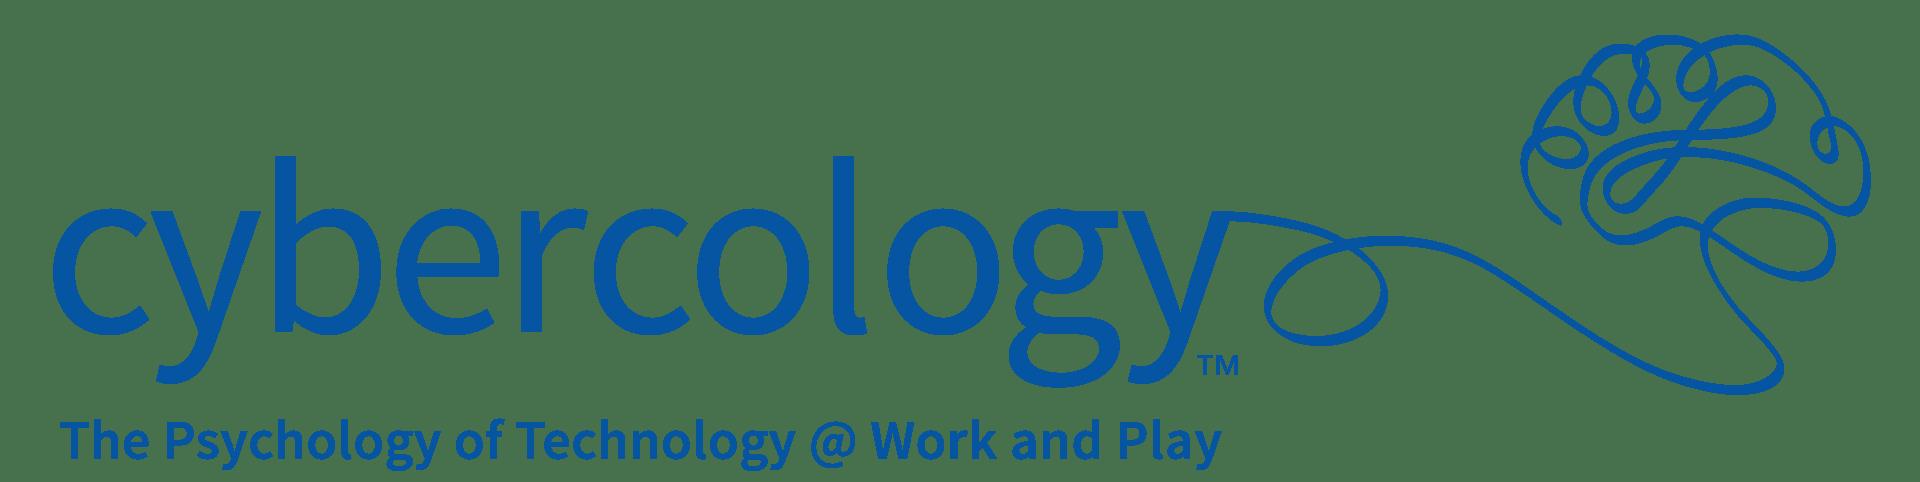 Cybercology